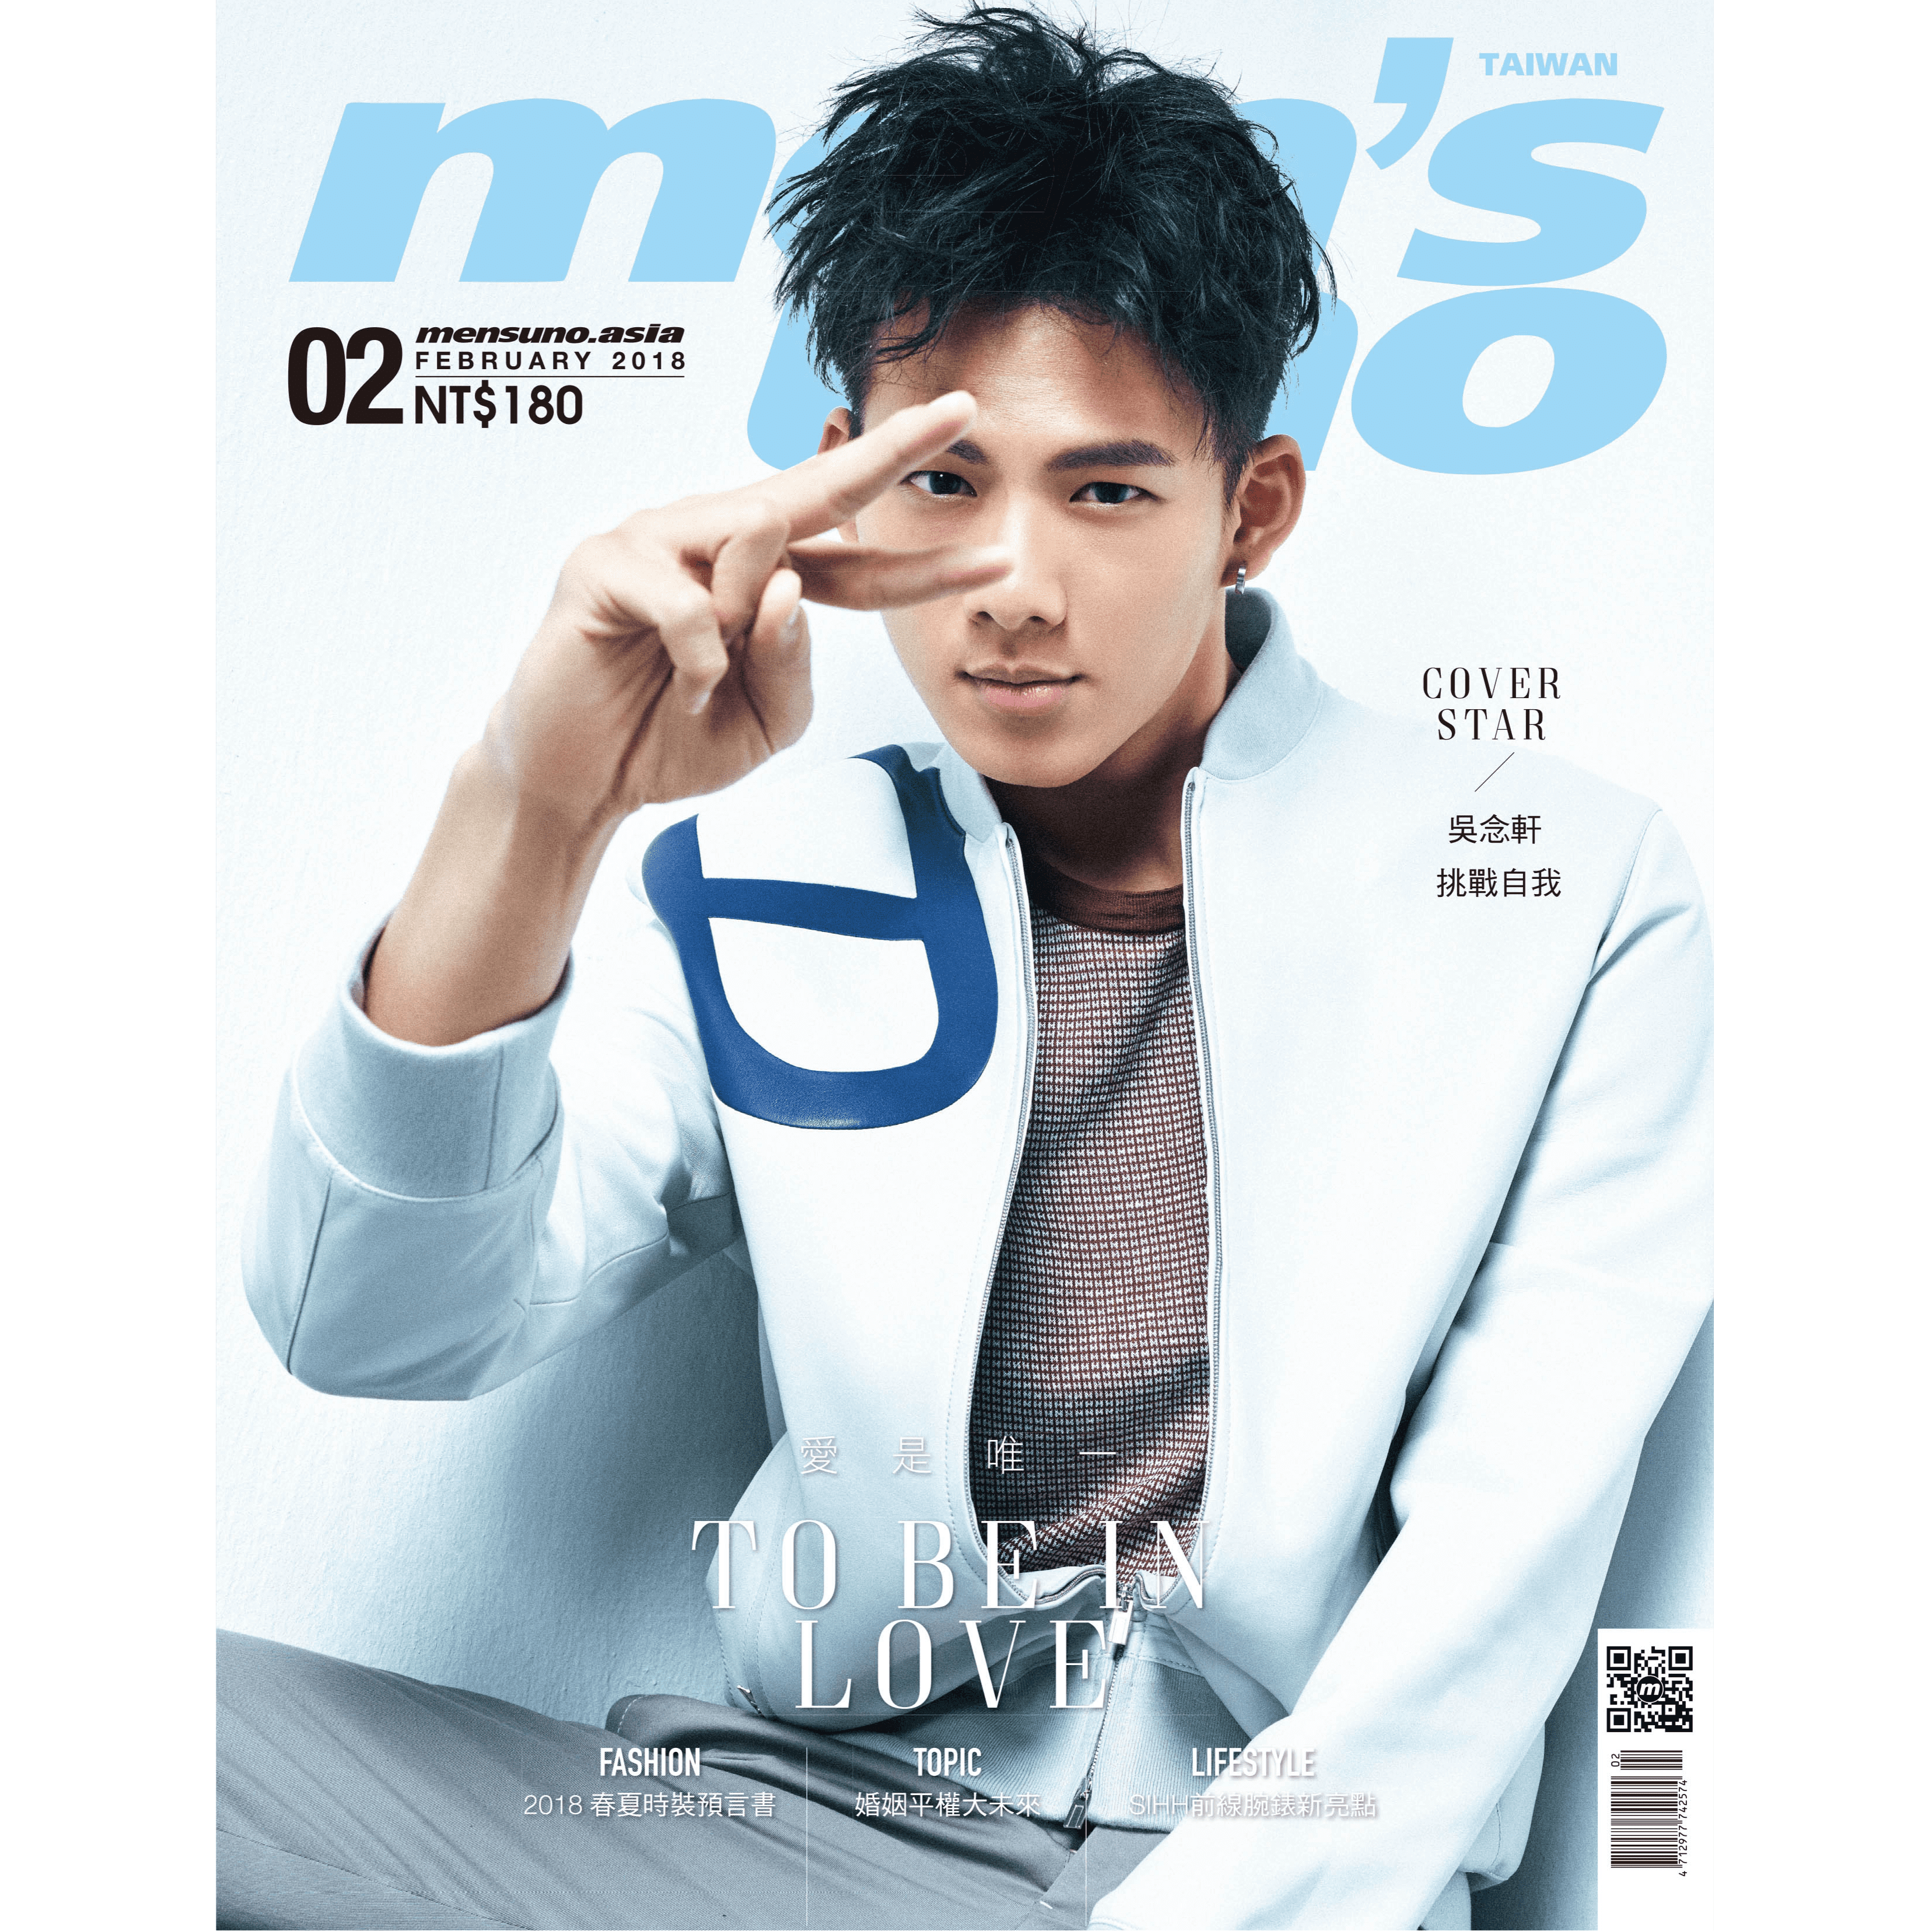 COVER STAR 吳念軒 挑戰自我